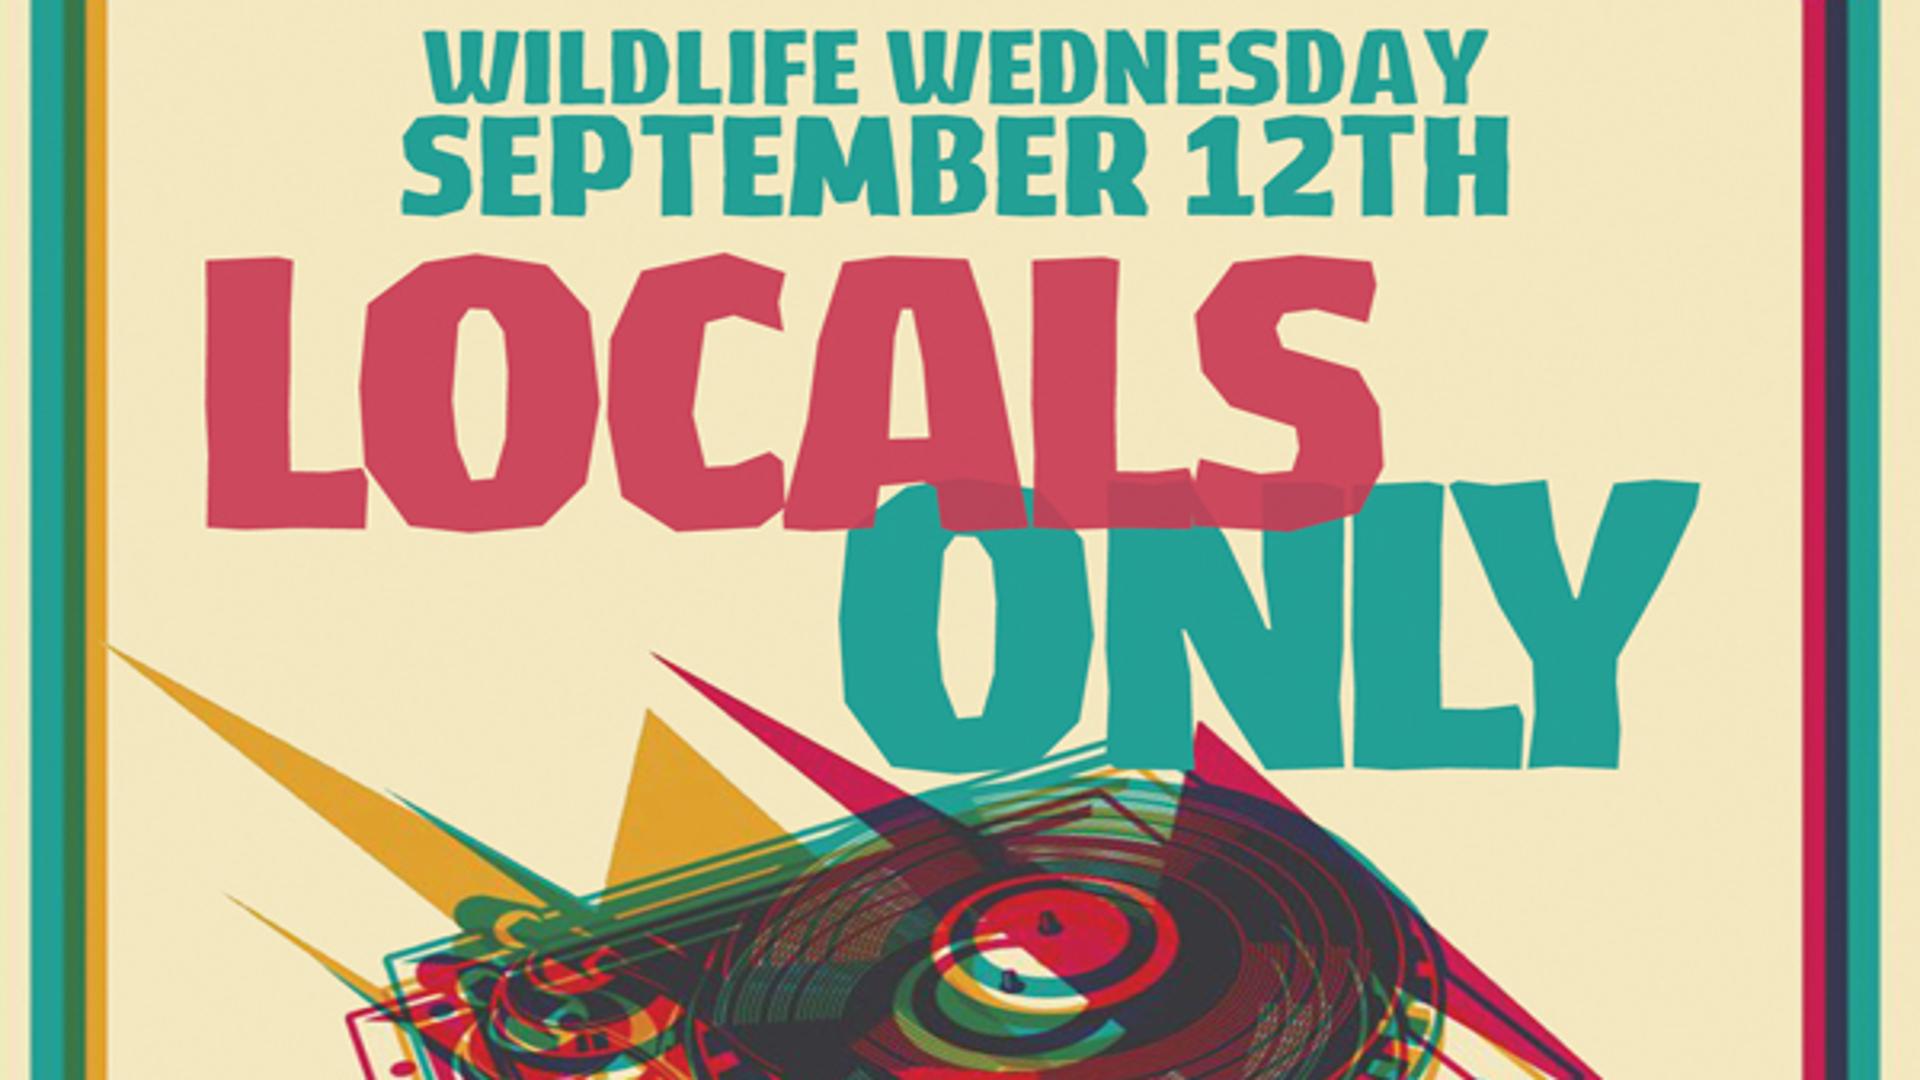 sasquatch locals only sept 12 2018 fb event.jpg